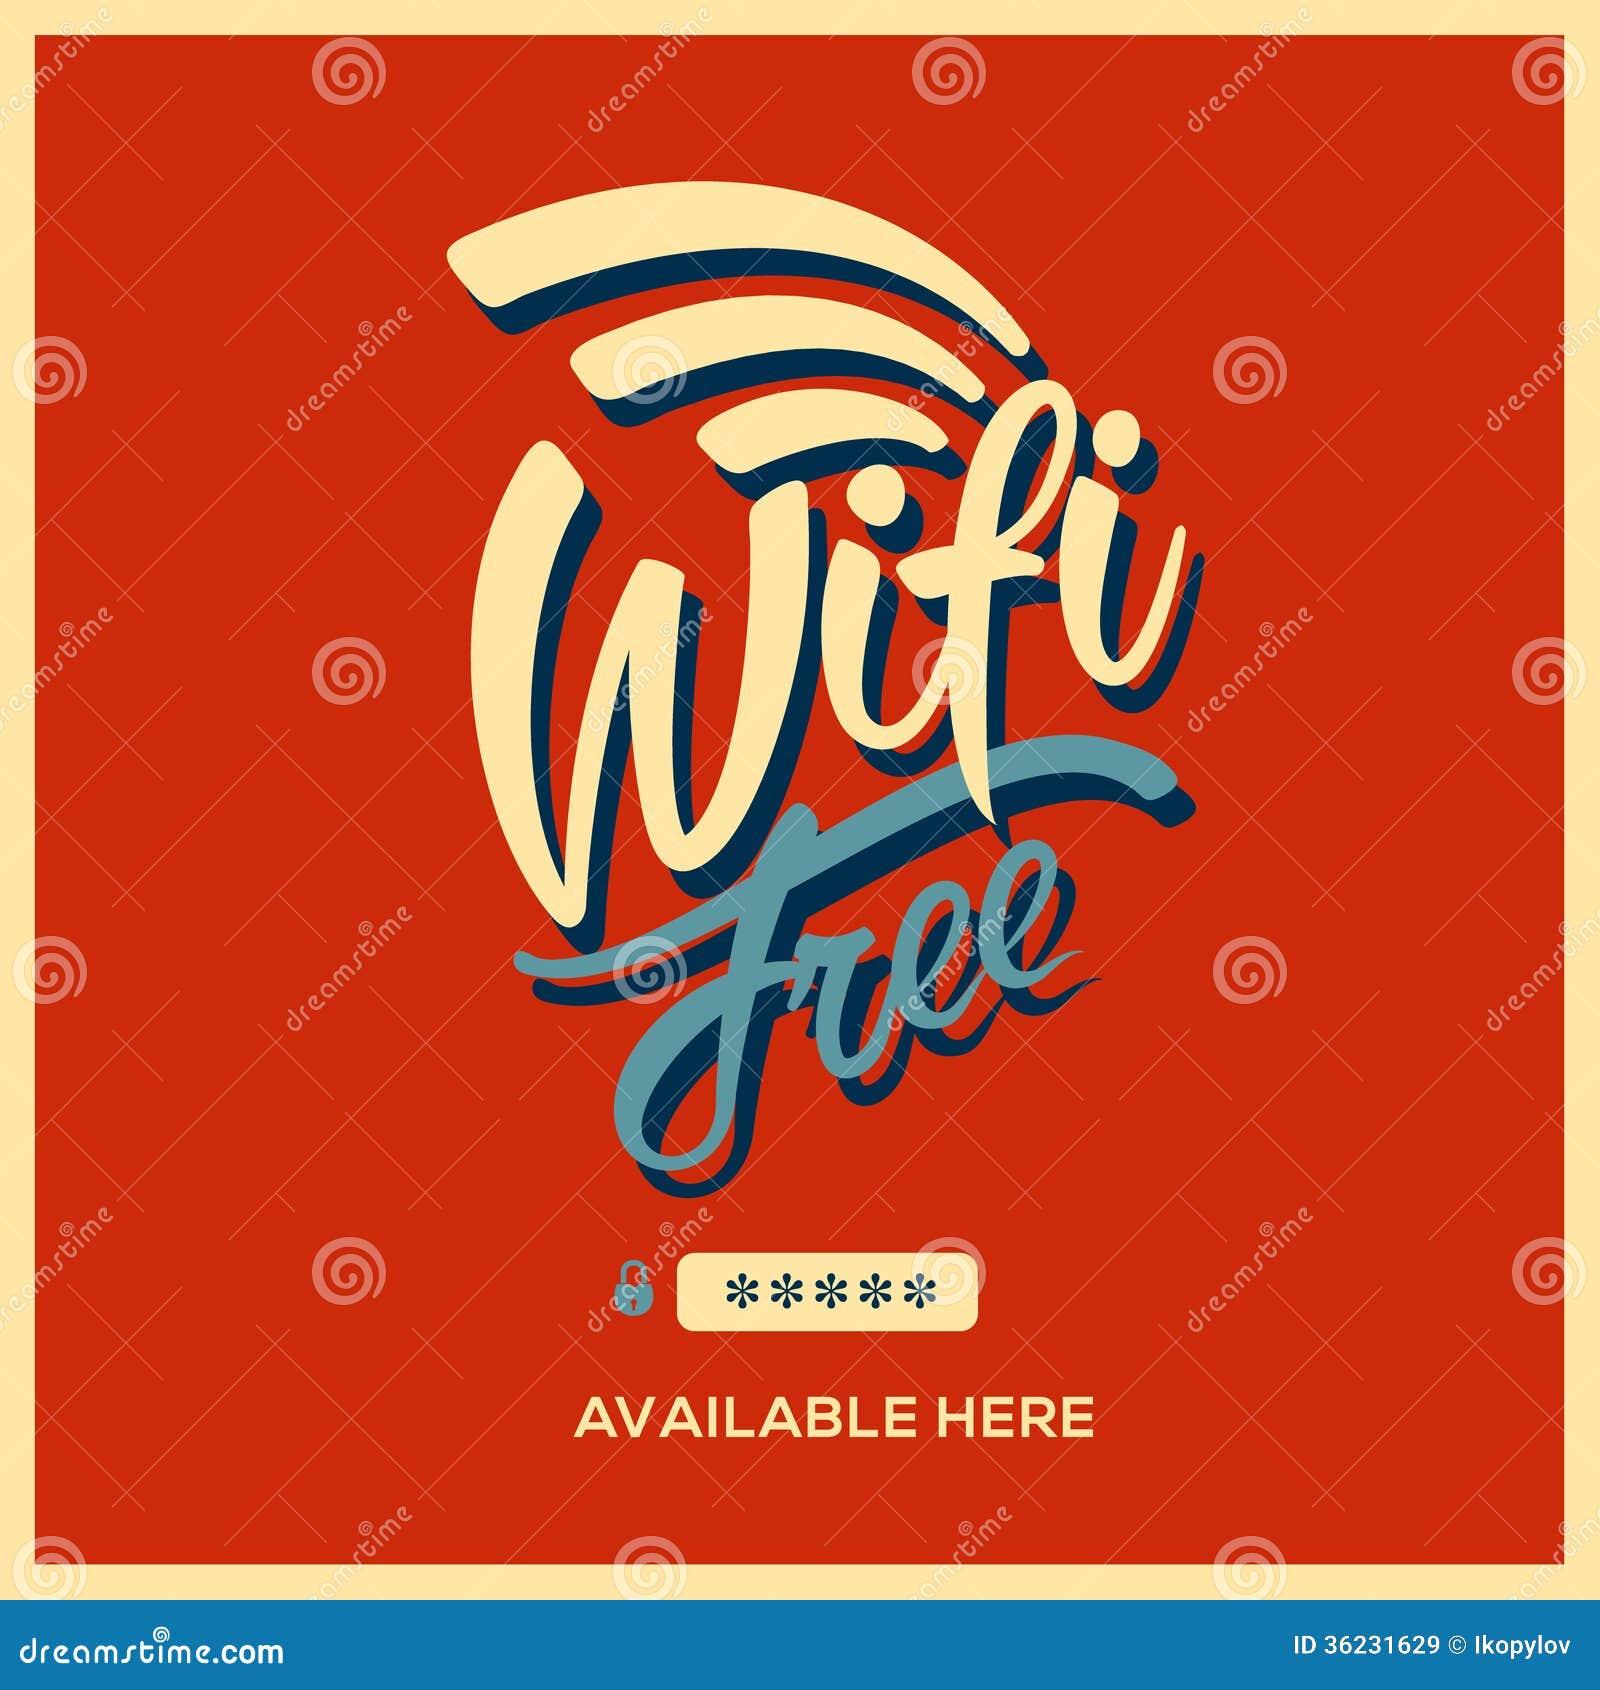 Free Wifi Symbol Retro Style Royalty Free Stock Images ...